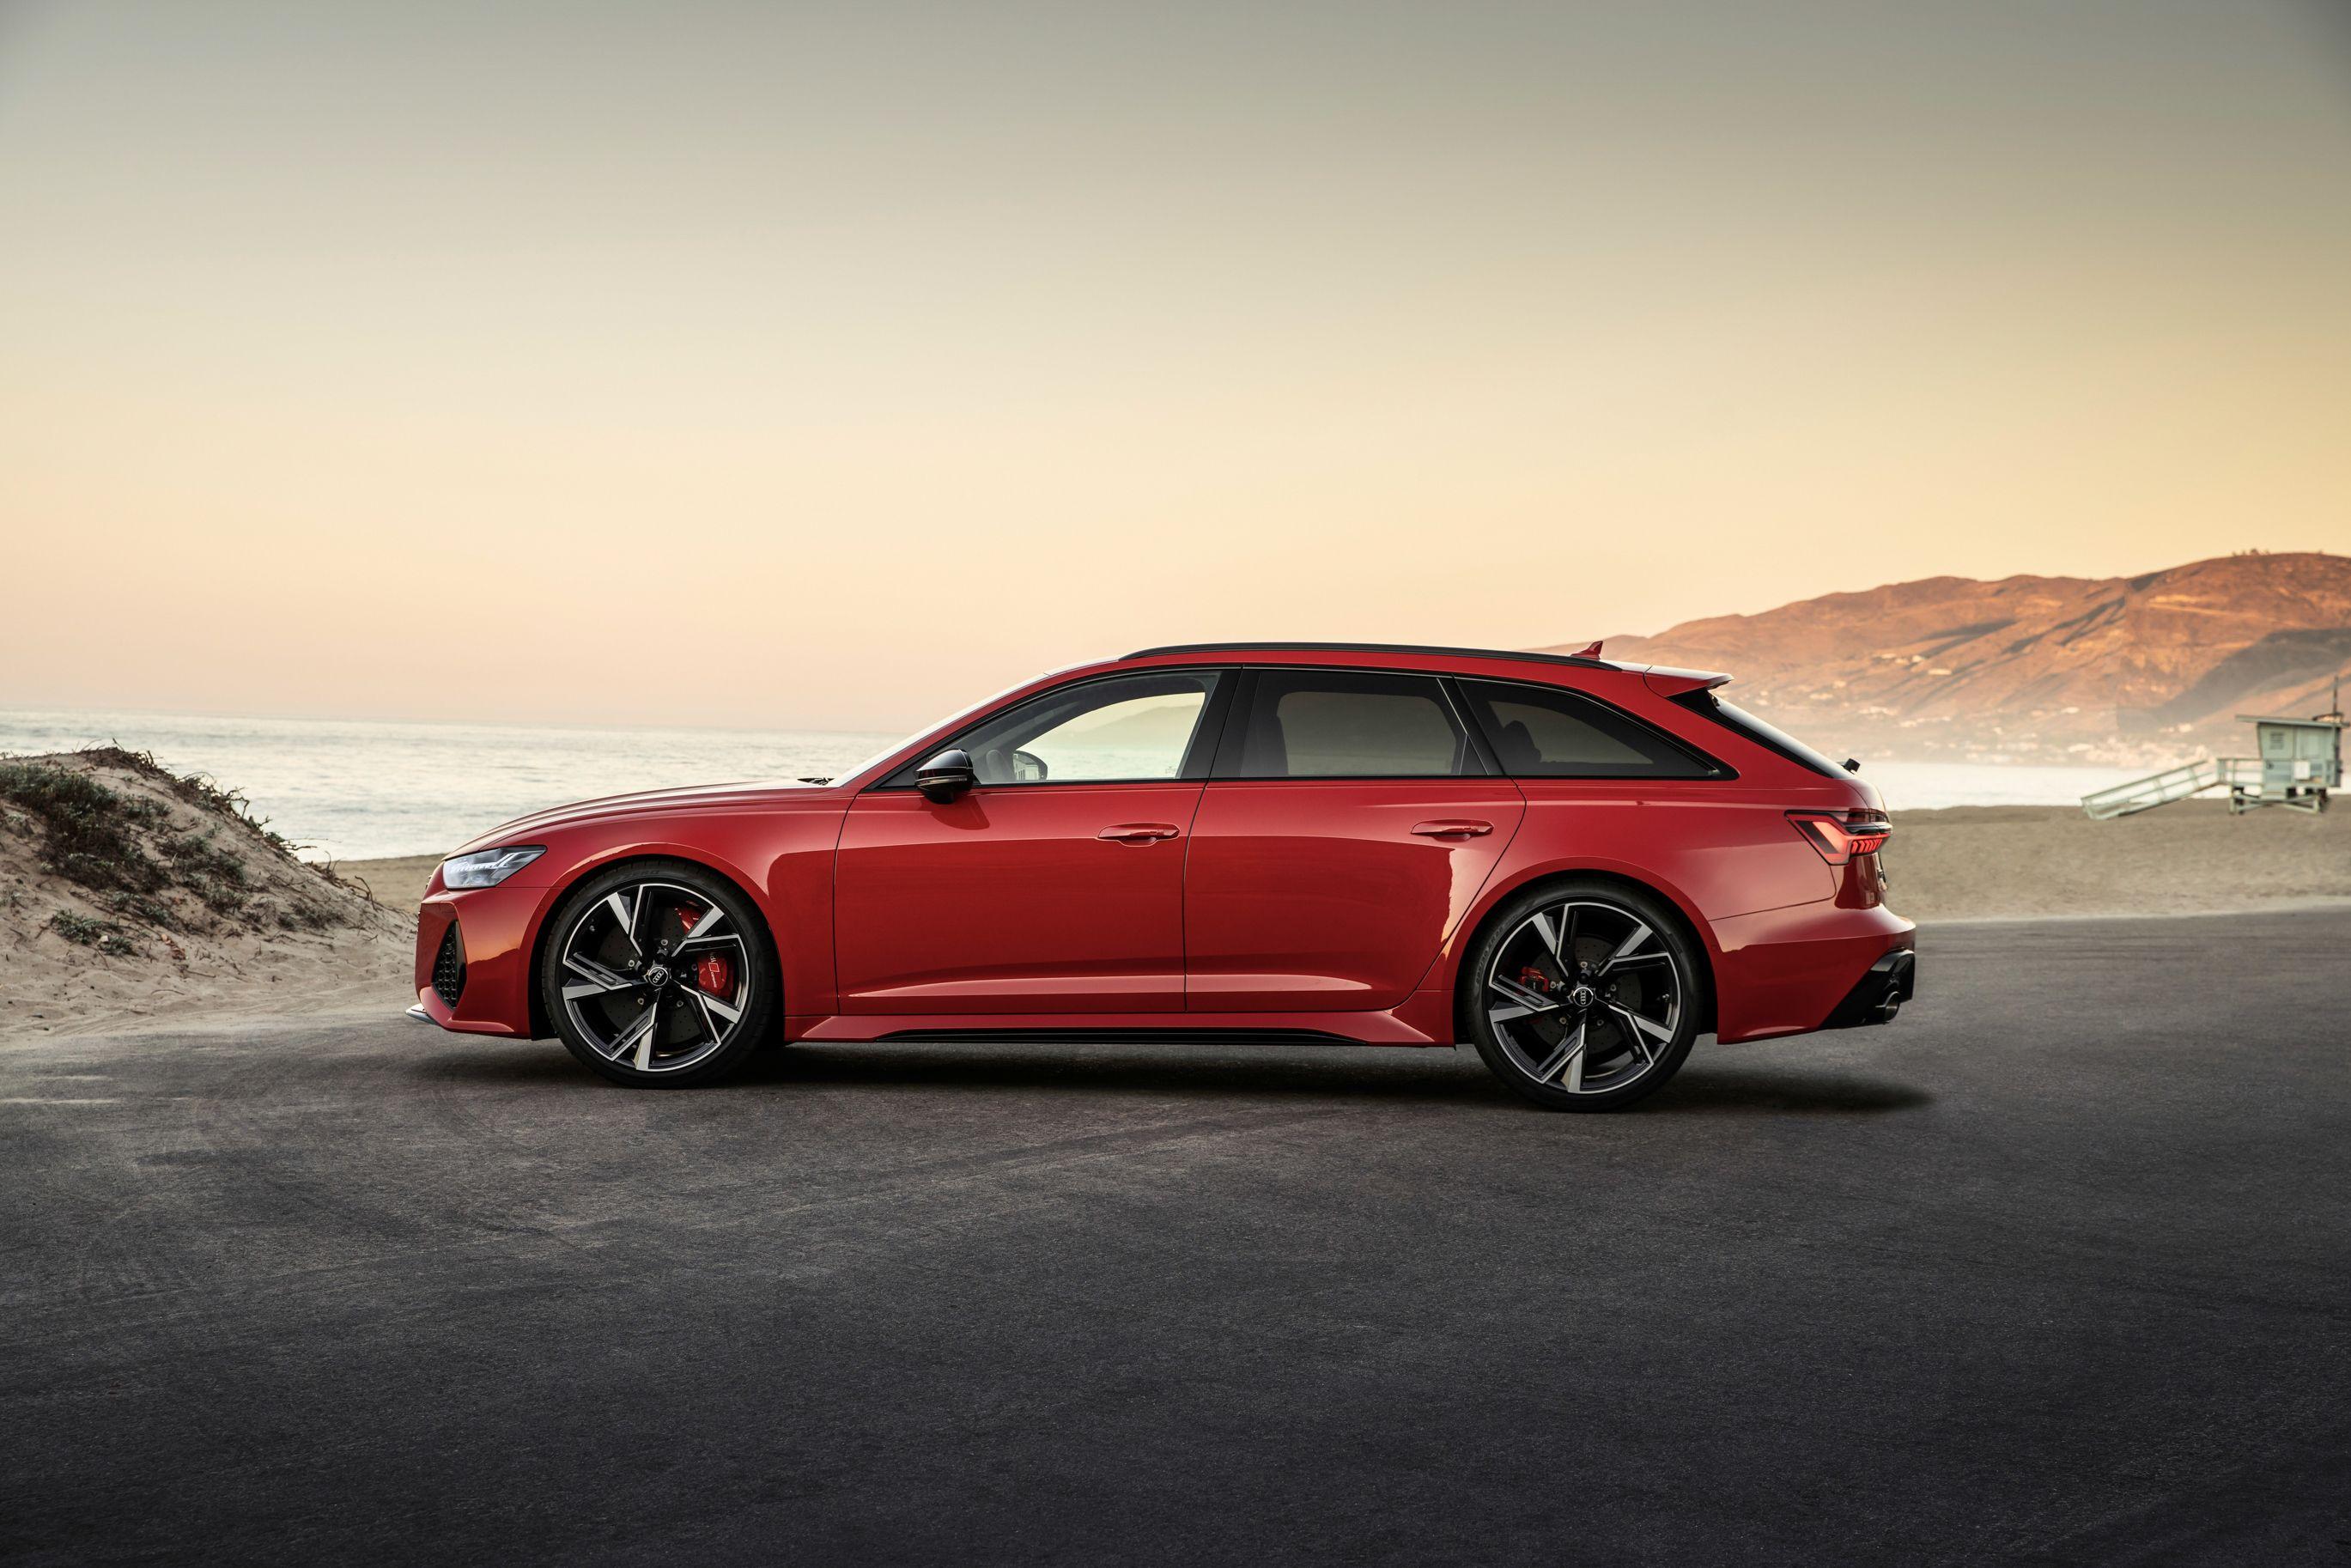 Audi Rs6 Avant And Rs7 Sportback Uk Pricing Announced Audi Rs6 Audi 2020 Audi